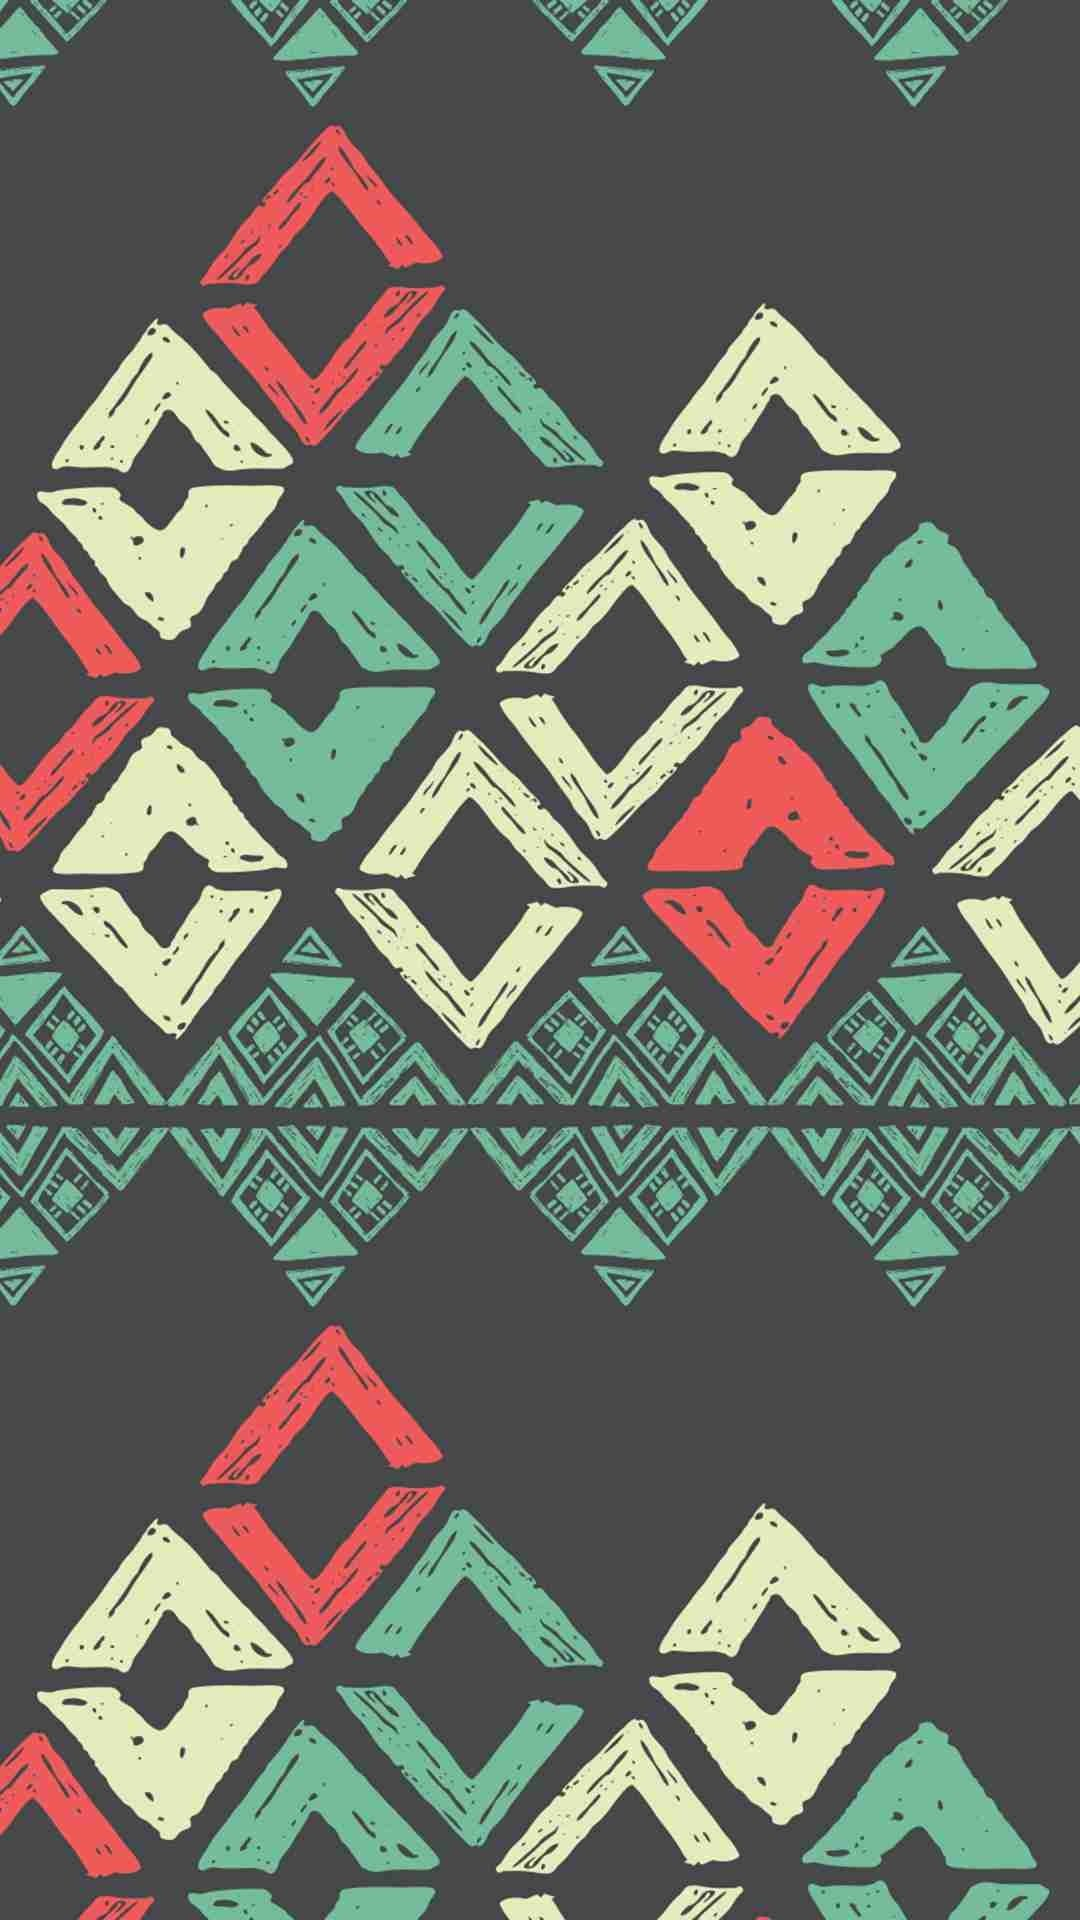 Tribal Pattern Wallpaper Hd Aztec Iphone Wallpaper 183 ① Wallpapertag